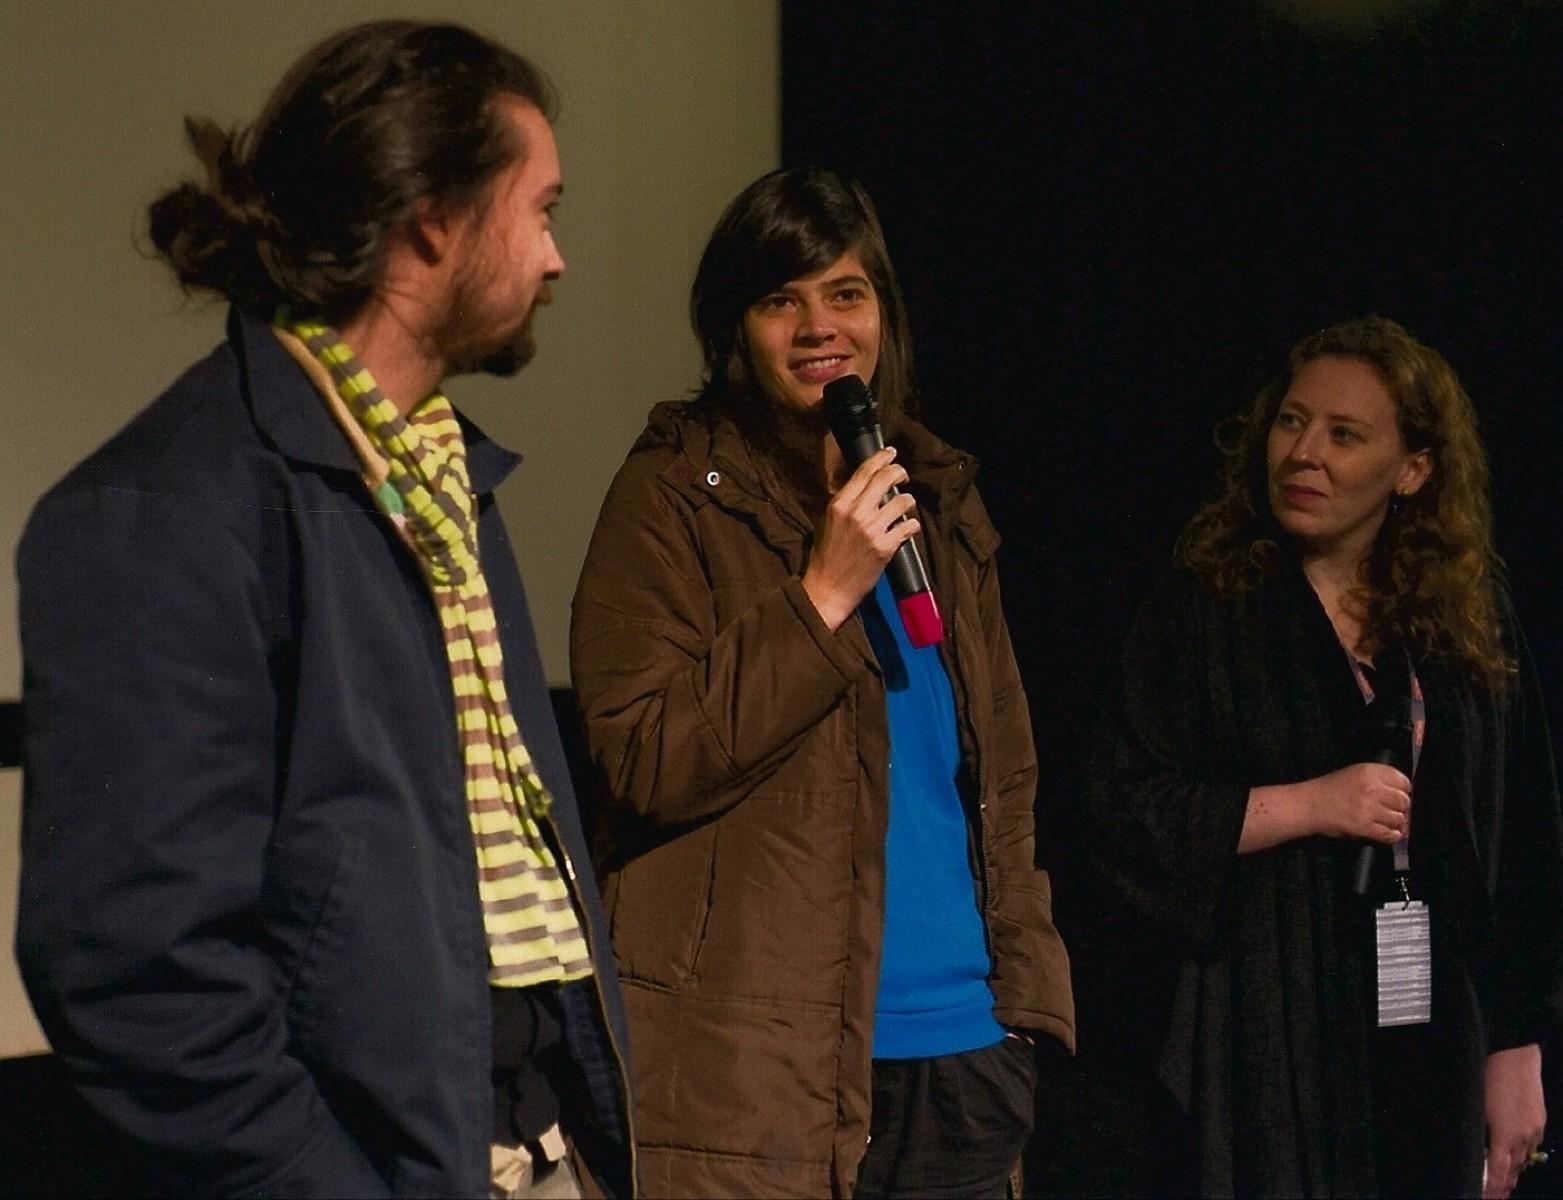 Israel Cardenas, Laura Amelia Guzman, Charlotte Garson